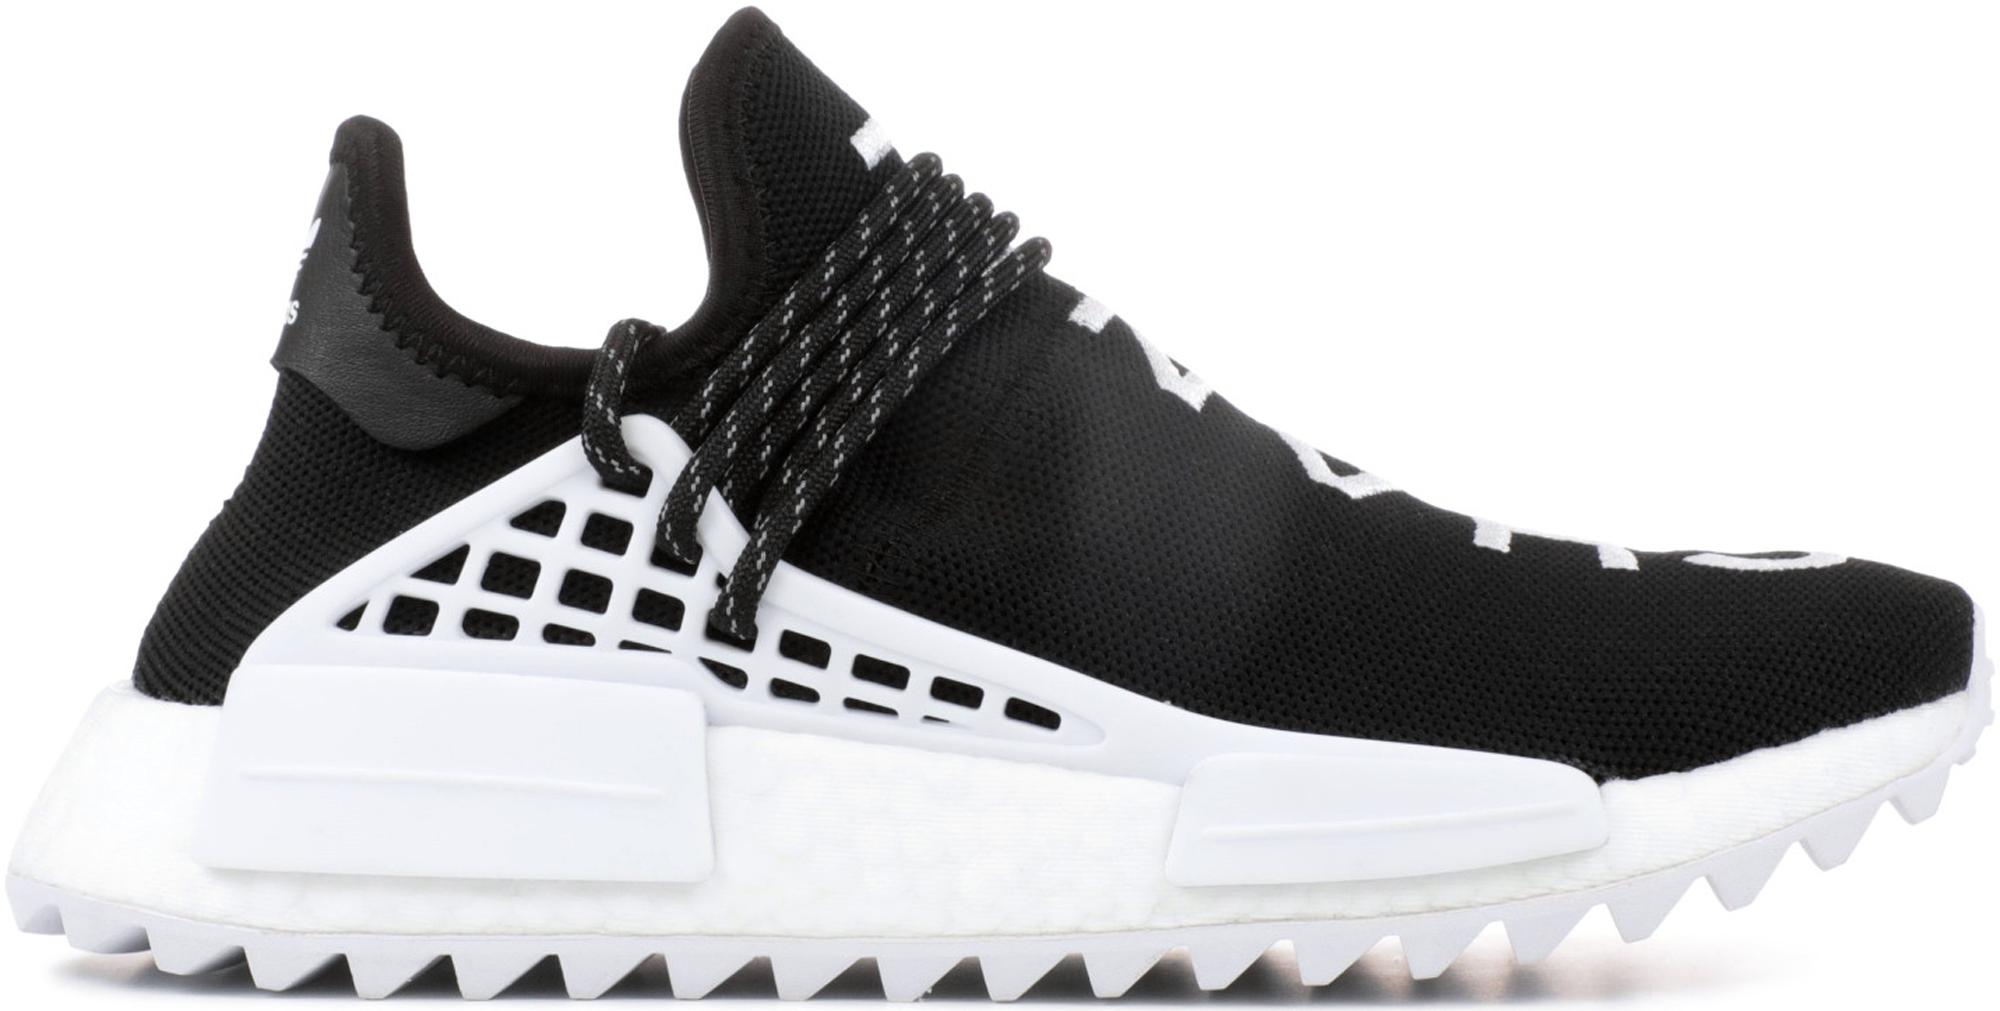 6f7e29c731b HypeAnalyzer · adidas Human Race NMD Pharrell x Chanel (Sample)